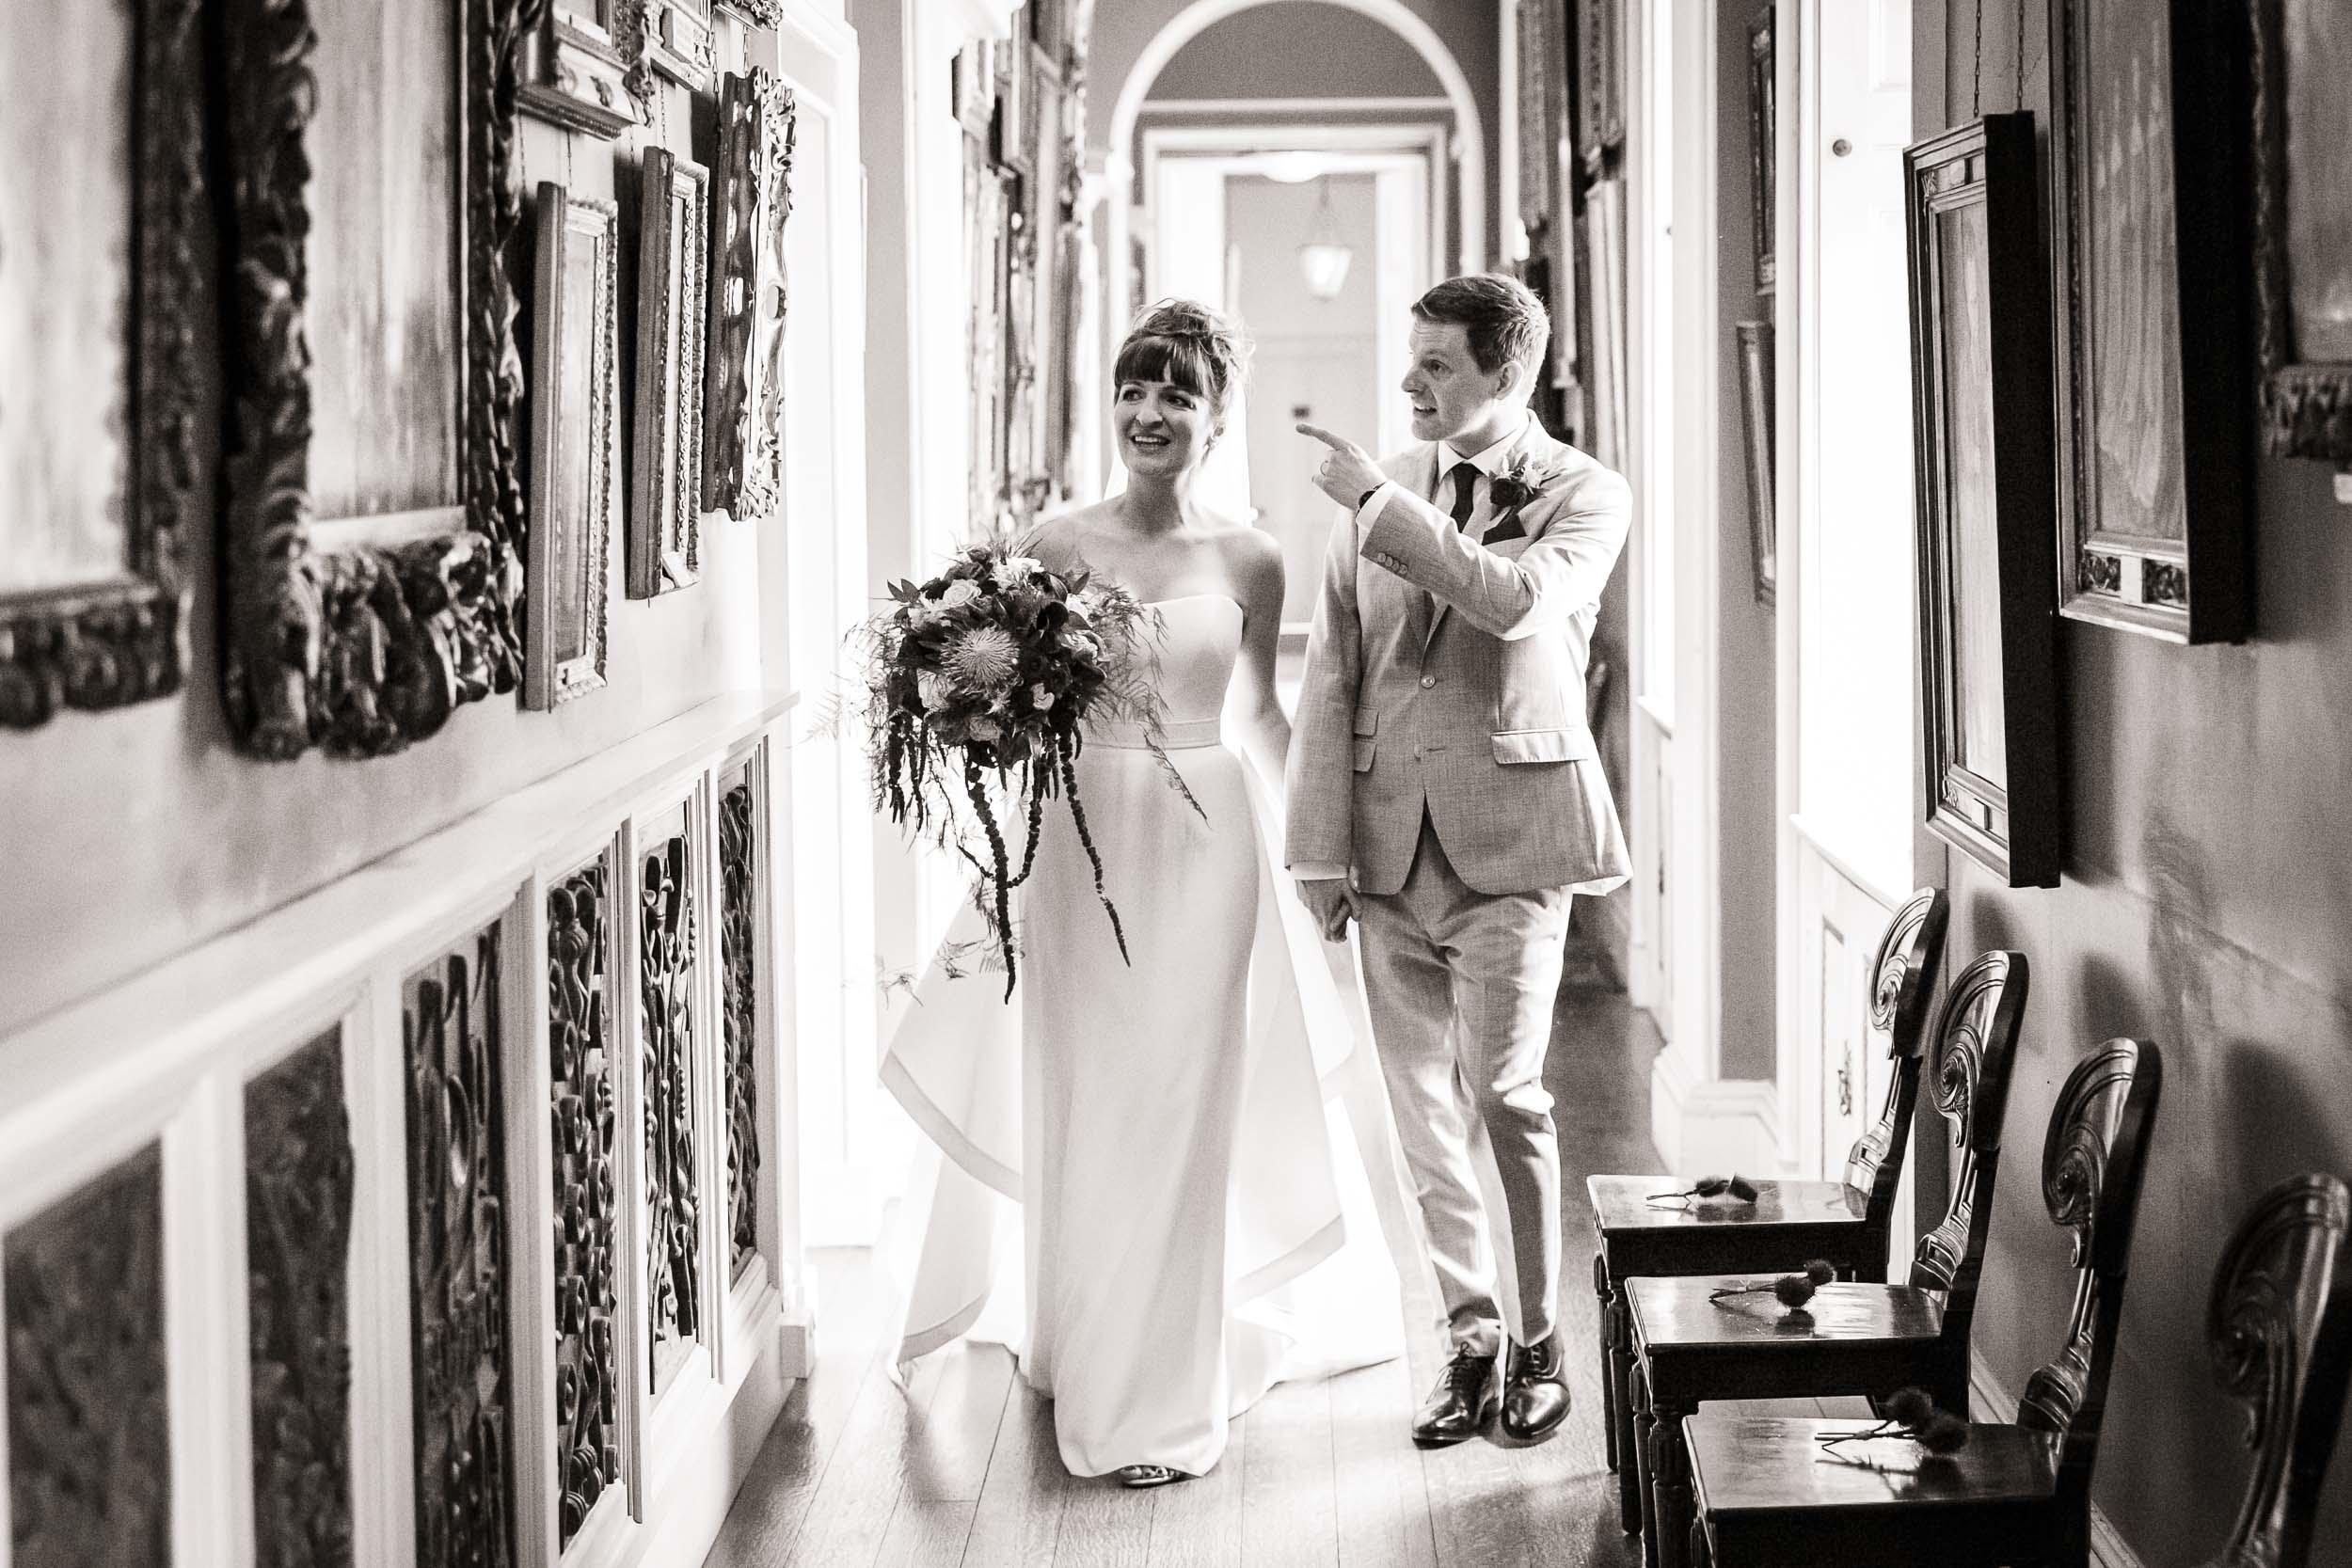 syon-house-wedding-photographer-london 076.jpg